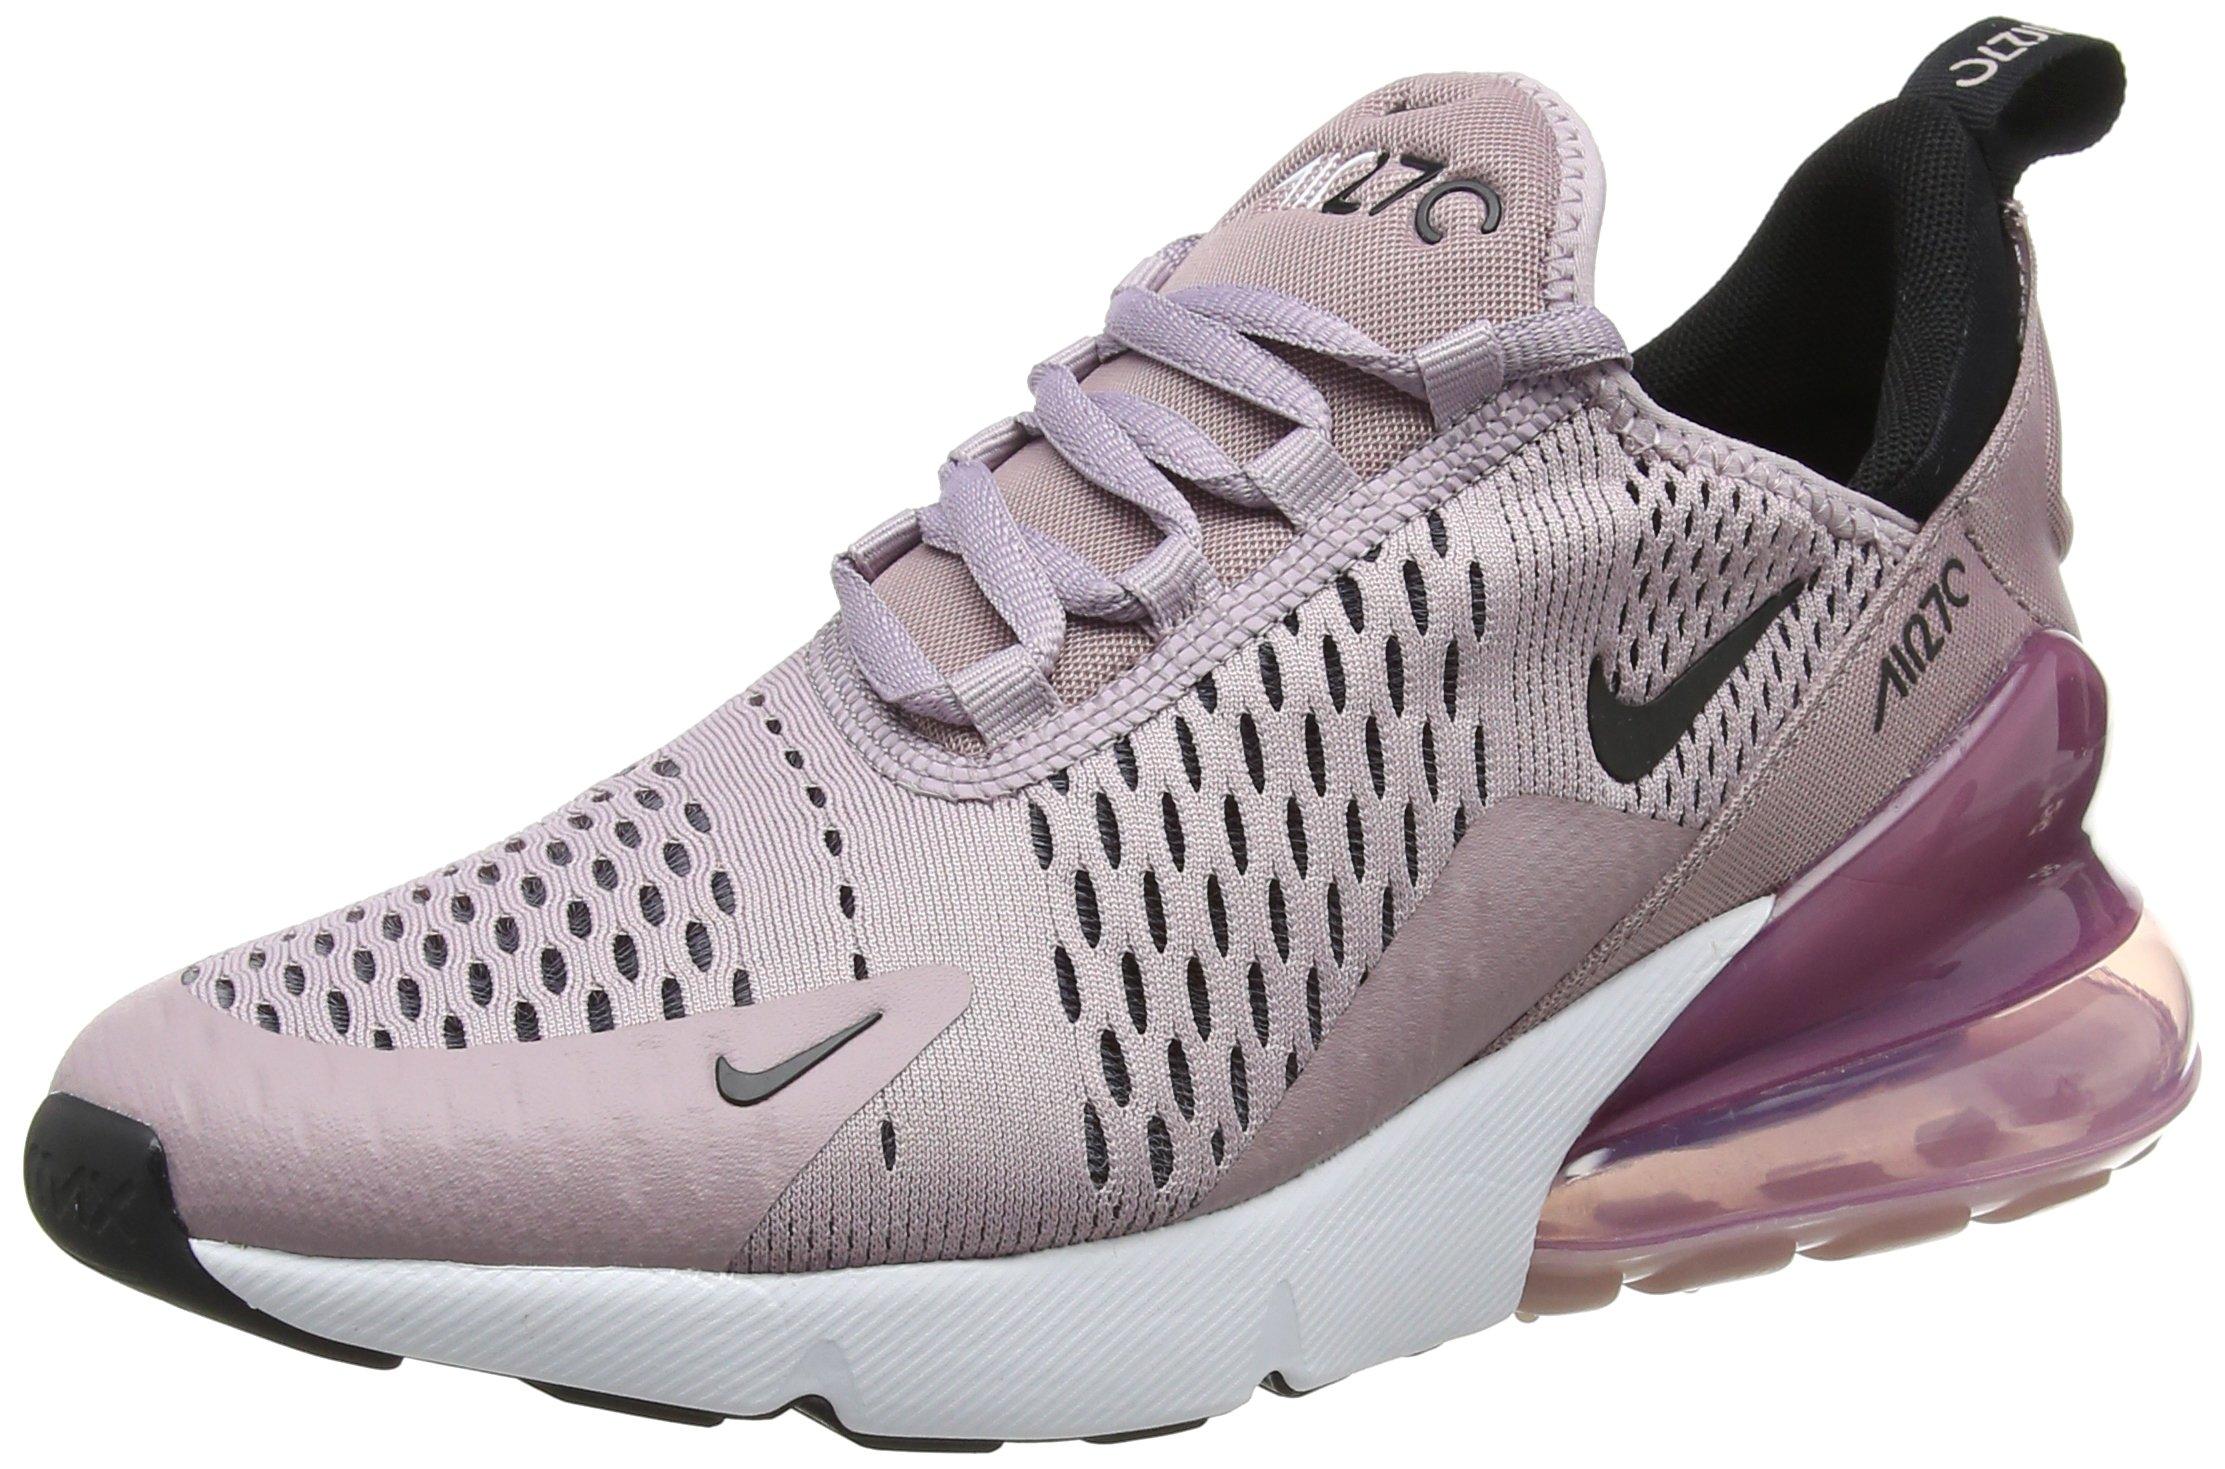 Galleon Nike Air Max 270 (gs) Big Kids 943345 601 Size 6